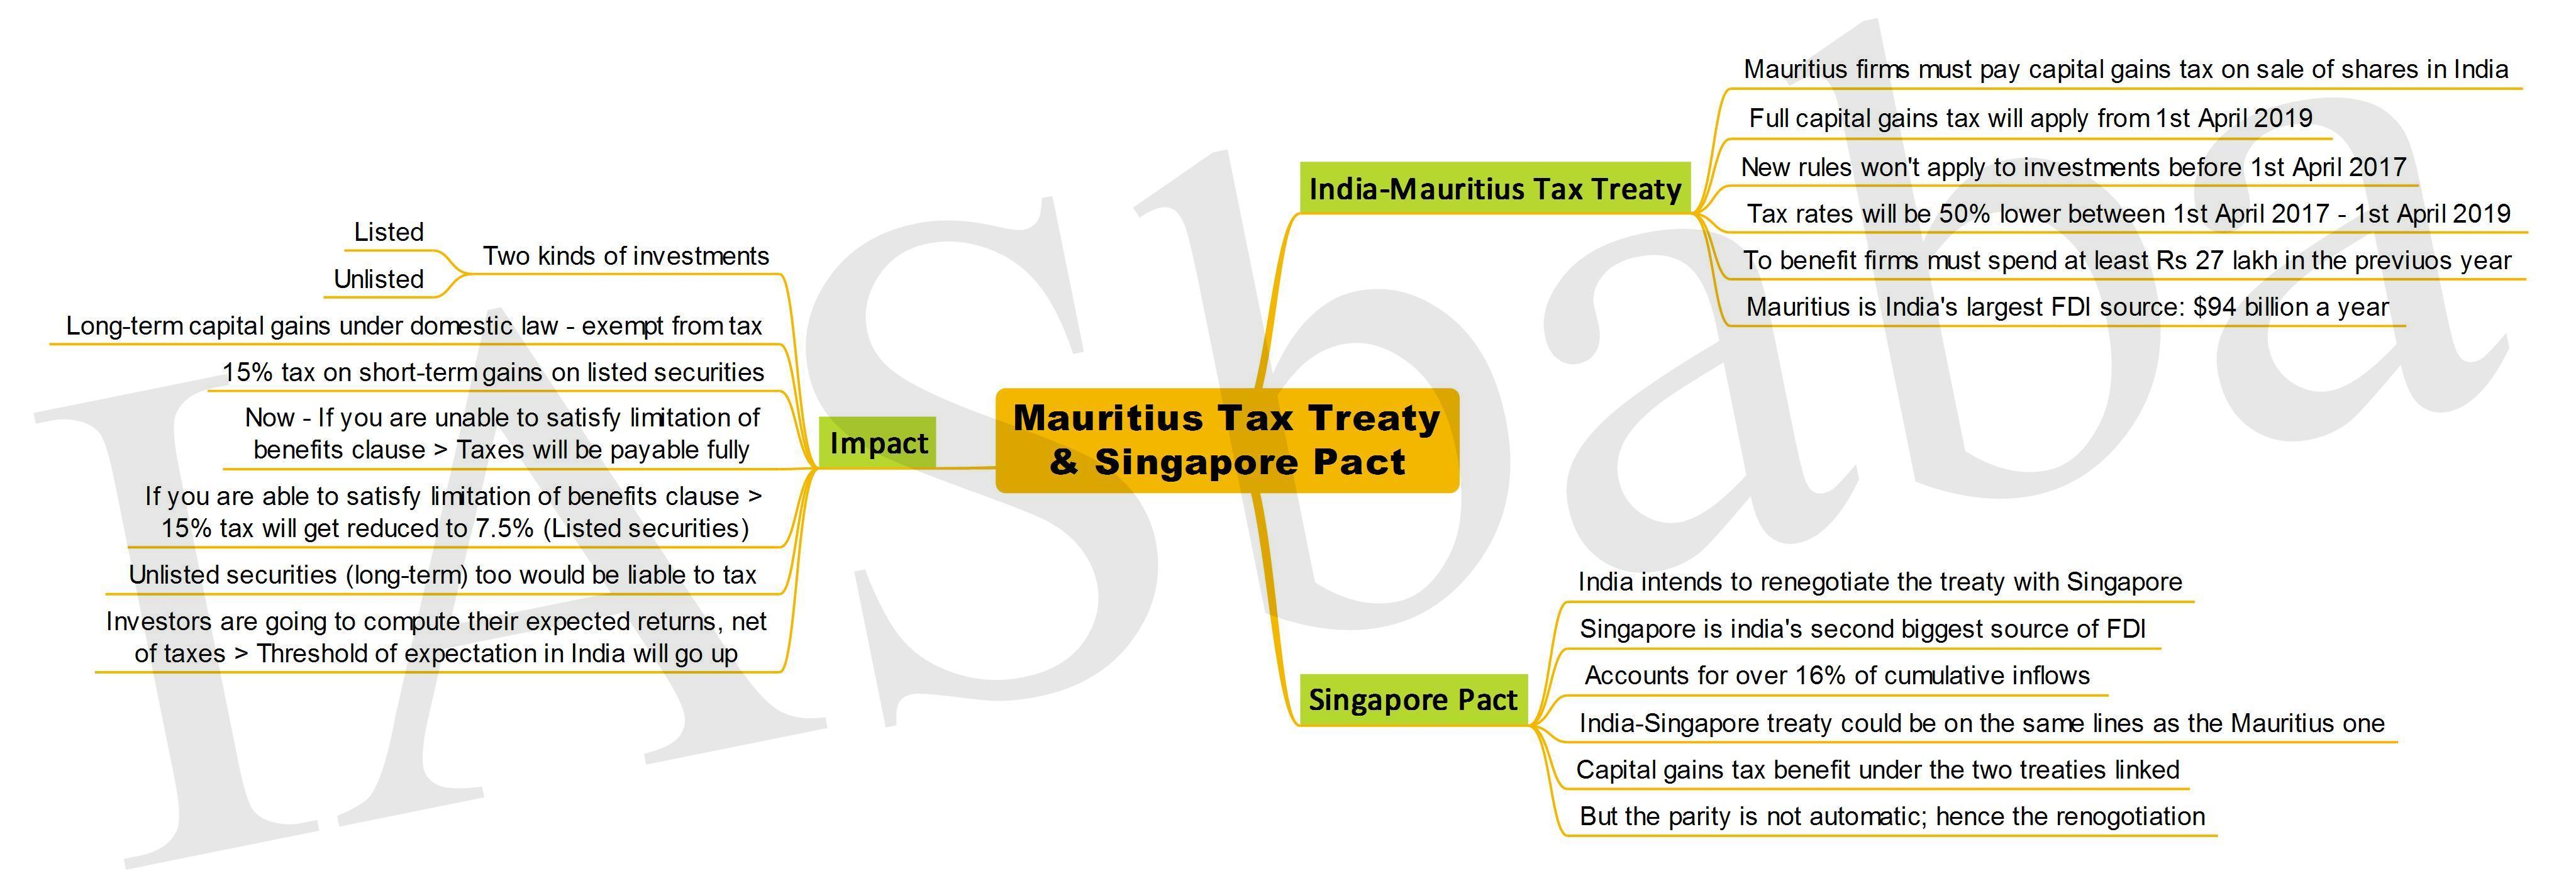 Mauritius Tax Treaty and Singapore Pact IASbaba